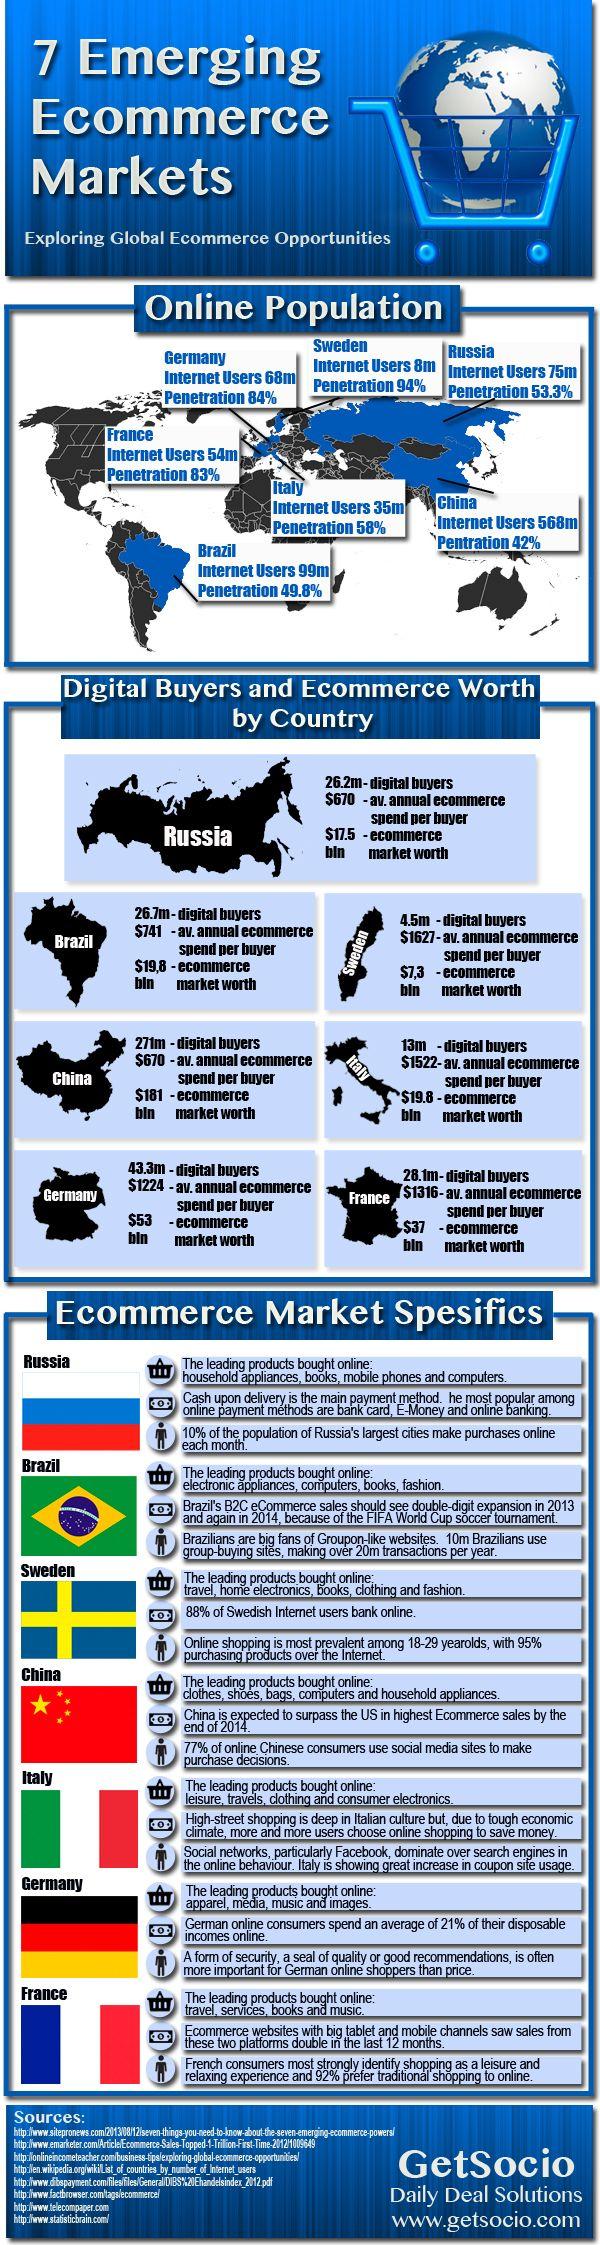 7 mercados emergentes para comercio electrónico #nfografia #infographic #ecommerce